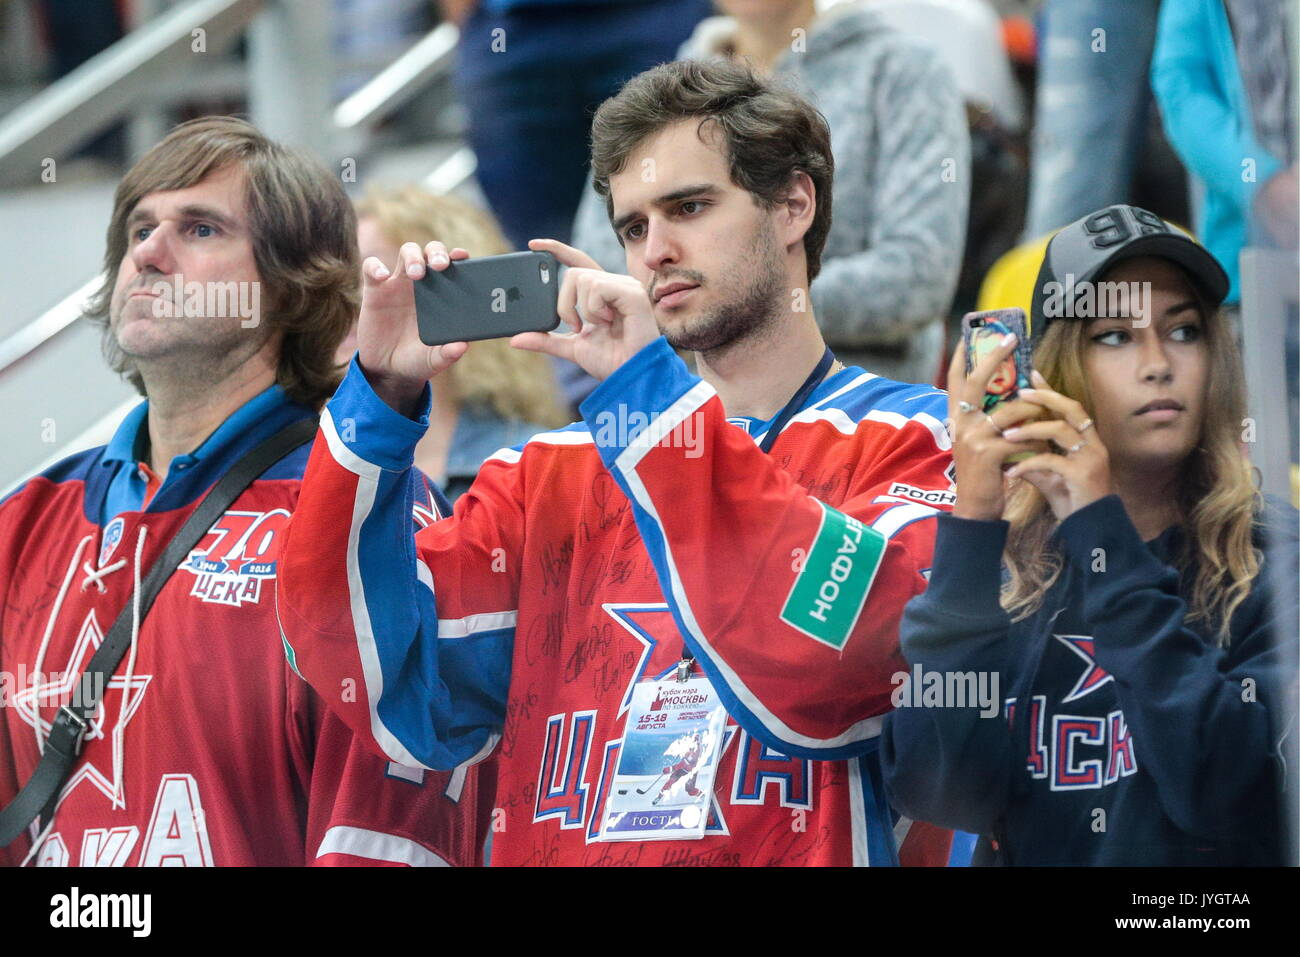 Moskau, Russland. 18 Aug, 2017. CSKA Moskau Fans in der Moskauer Bürgermeister Eishockey Cup Match gegen Dynamo Stockfoto